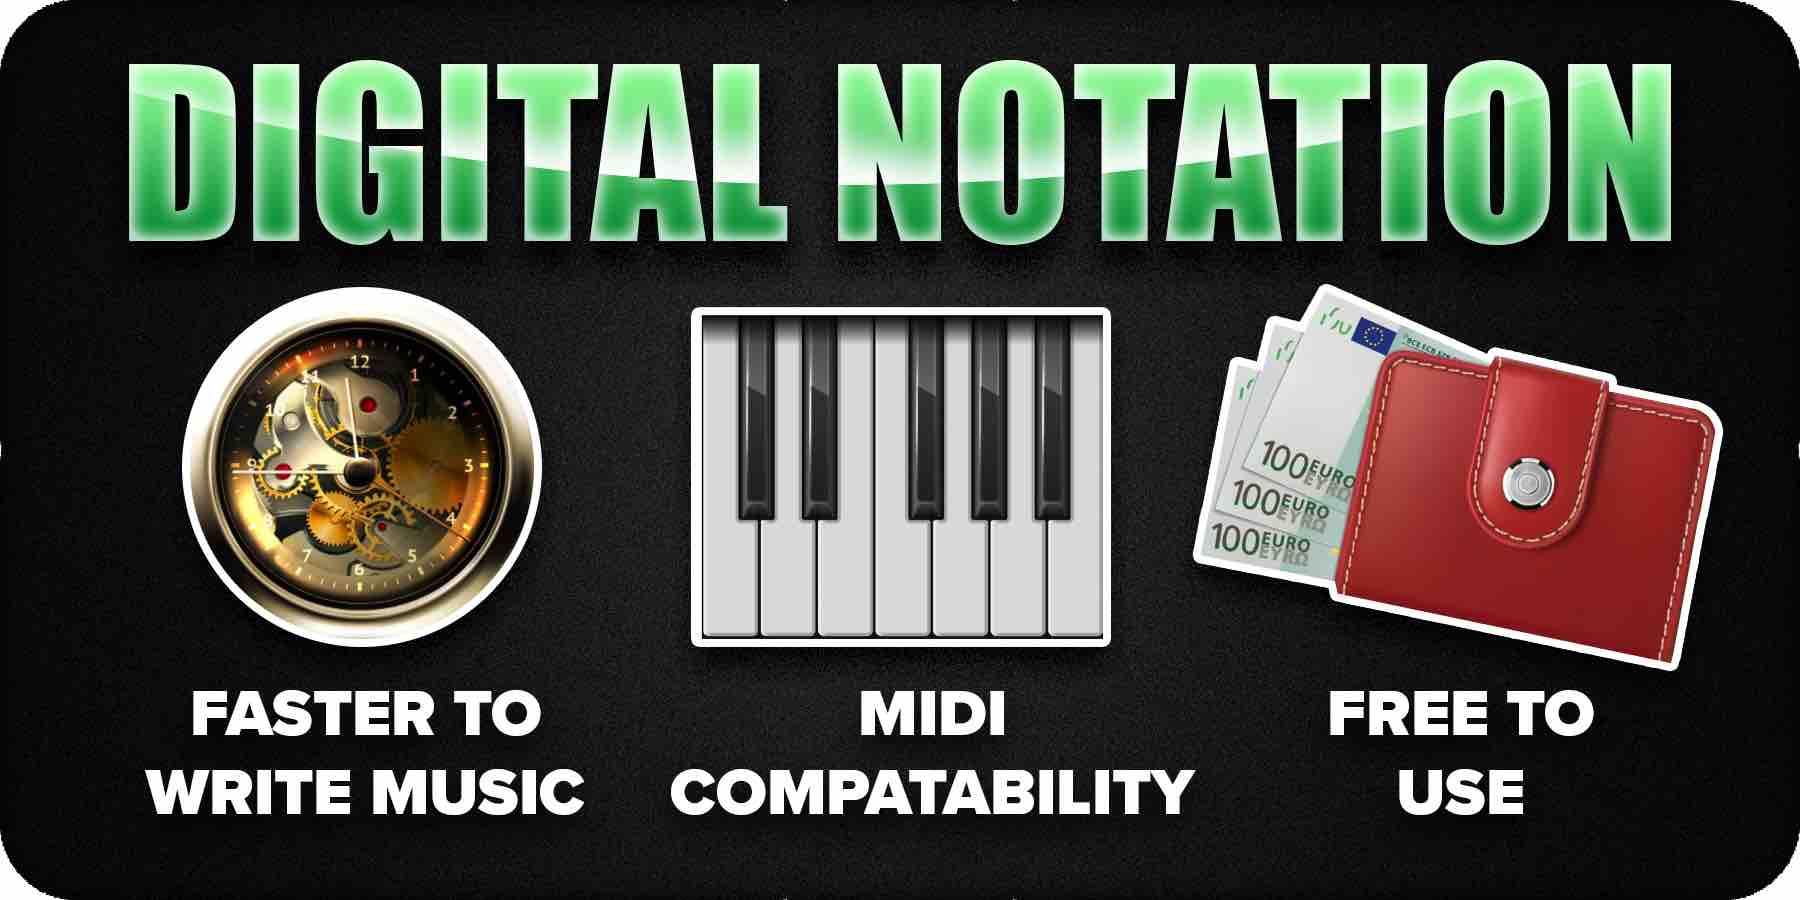 Digital Notation benefits